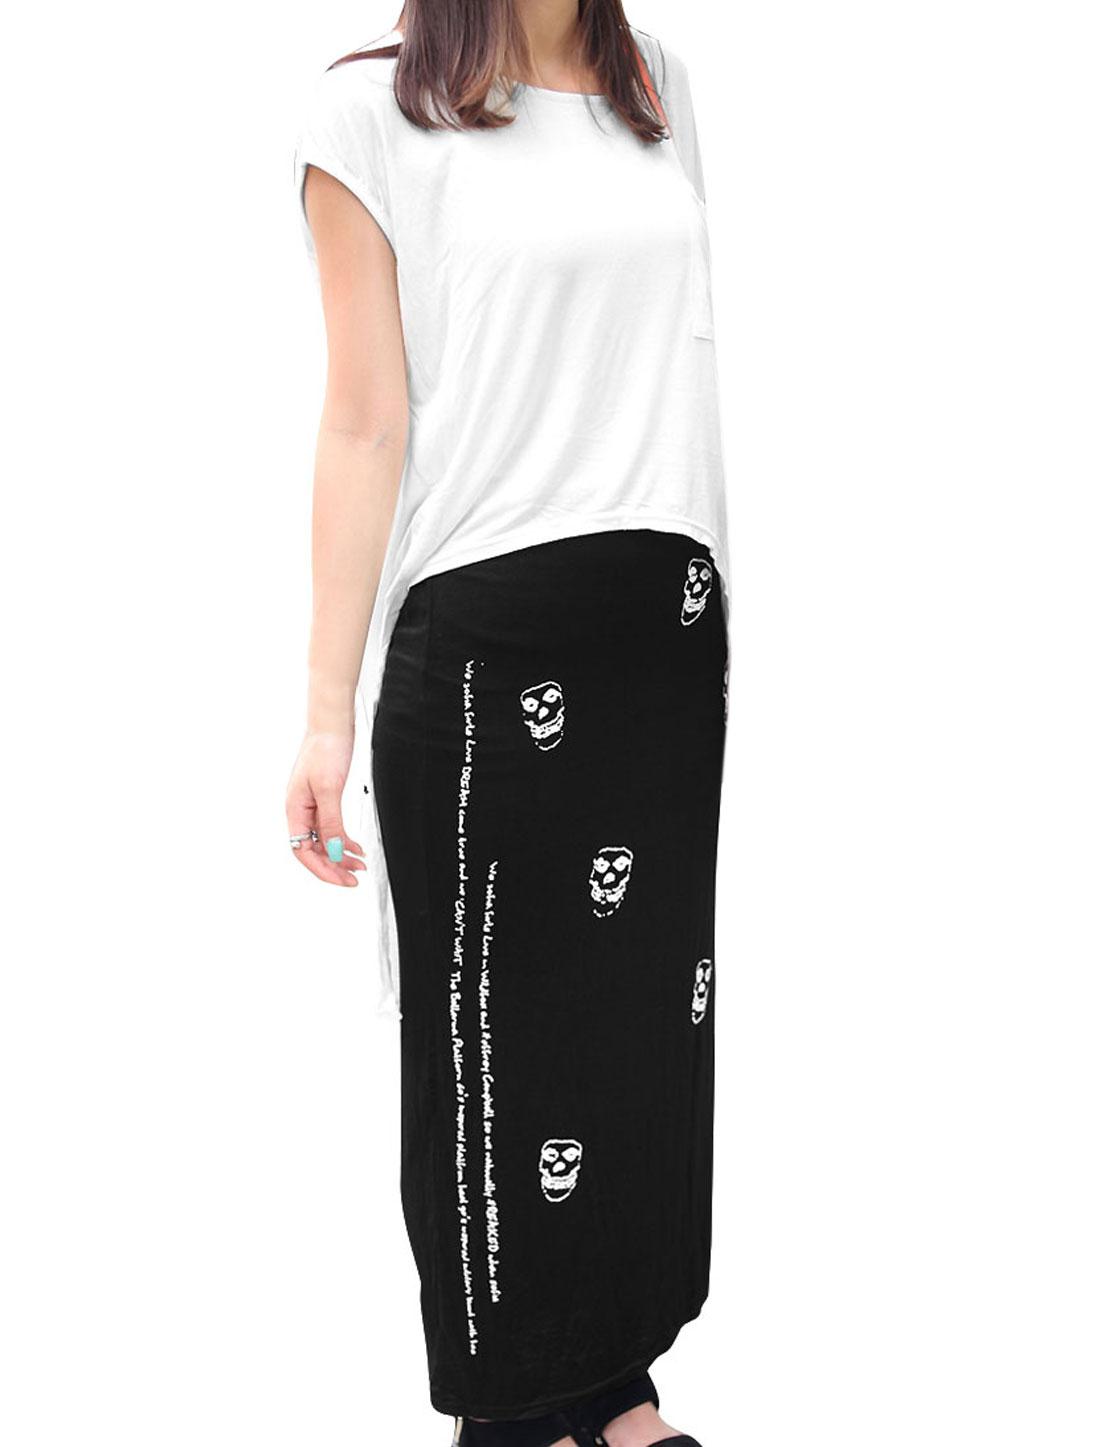 Women White Black XS Round Neck High Low Hem Top w Skull Pattern Dress